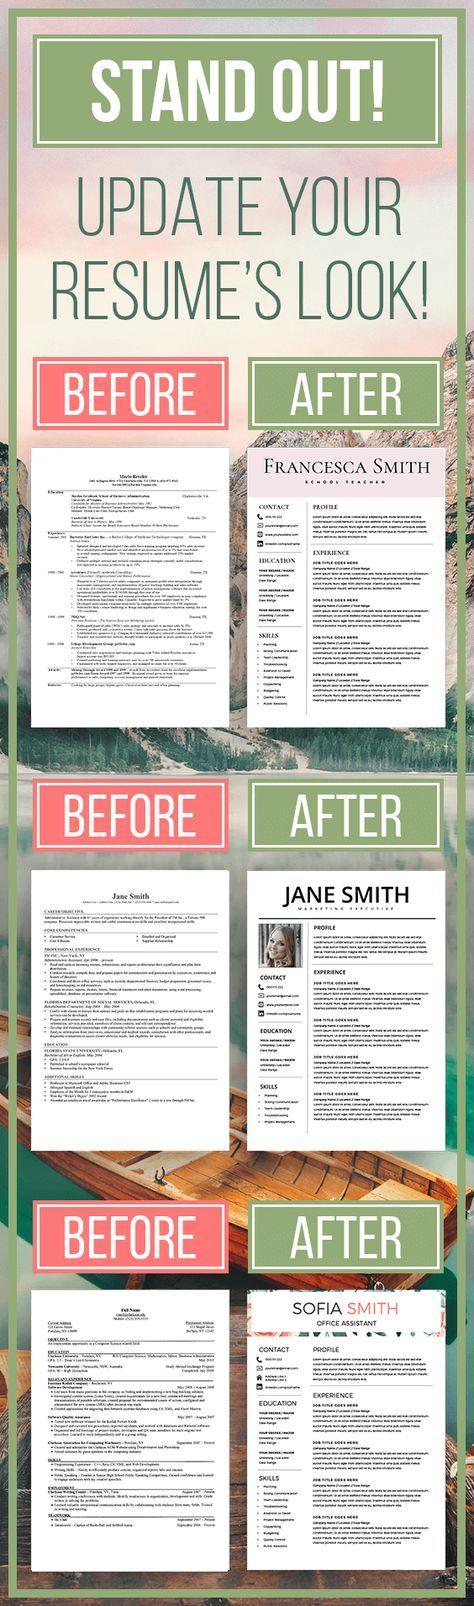 Top Resume Templates, creative cv templates, resume layout, professional cv template, modern resume format, modern cv template